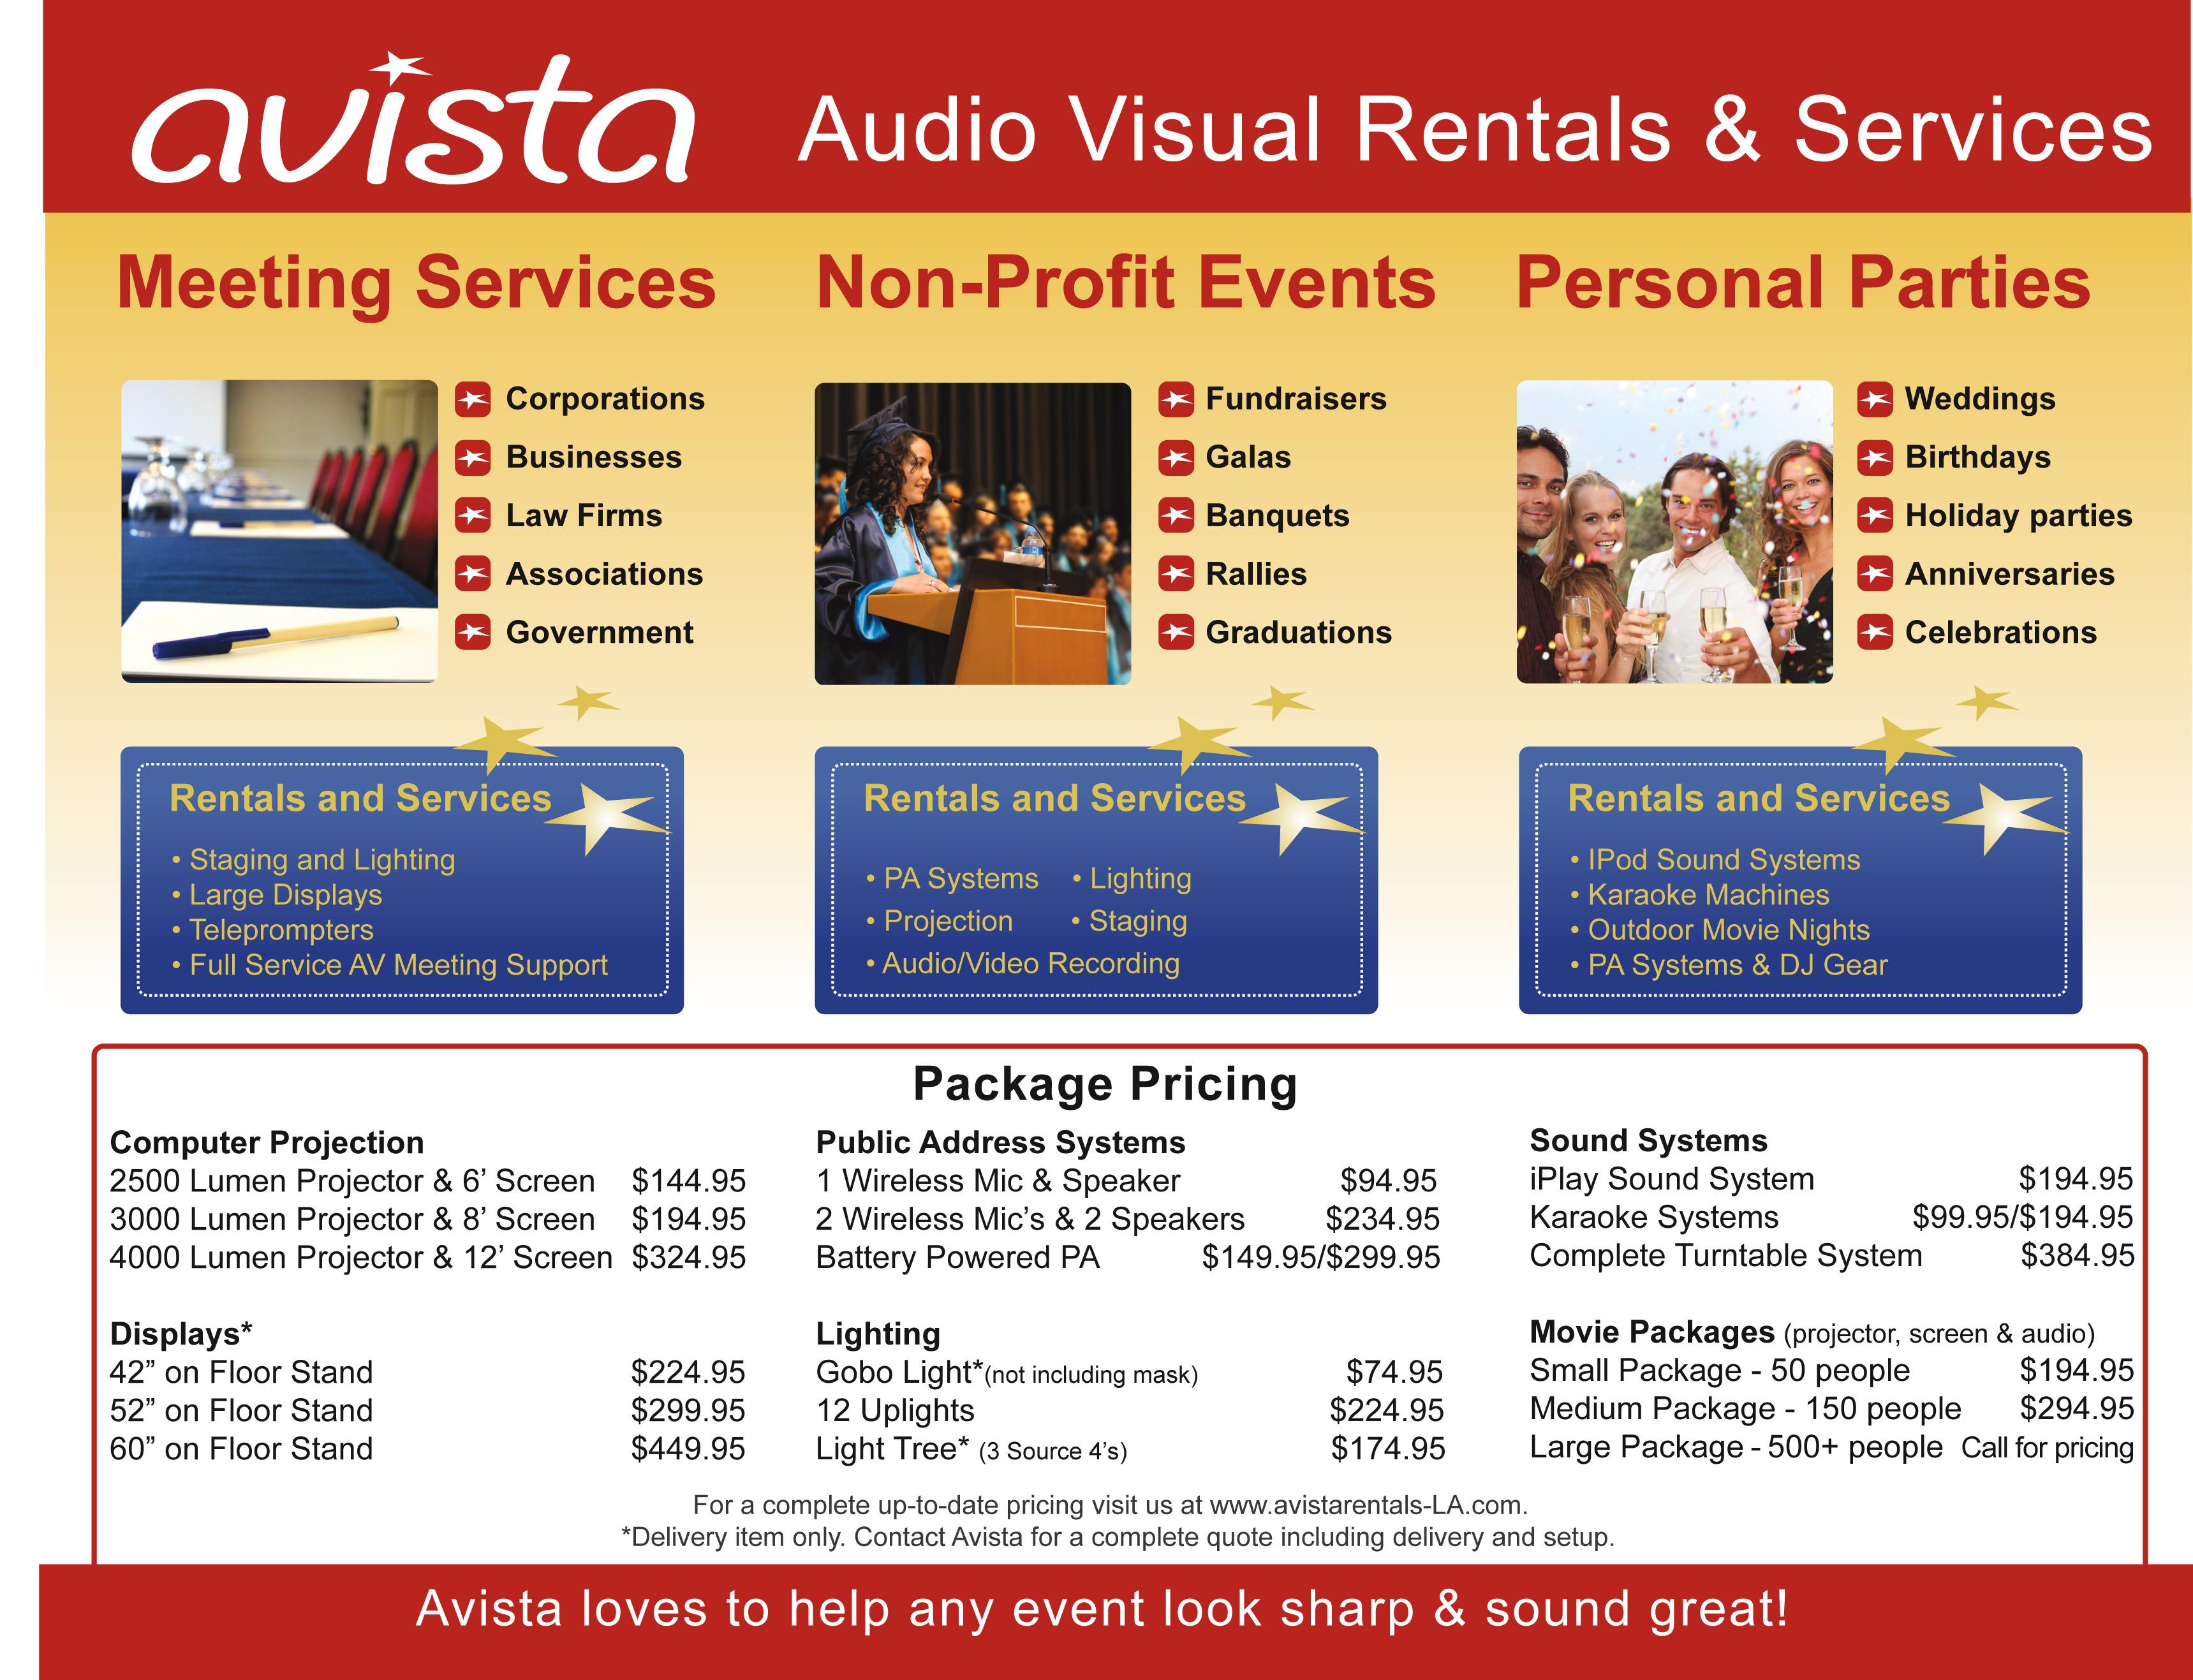 avista audio visual rentals attributes rapid growth to stellar customer service and 5 star yelp. Black Bedroom Furniture Sets. Home Design Ideas